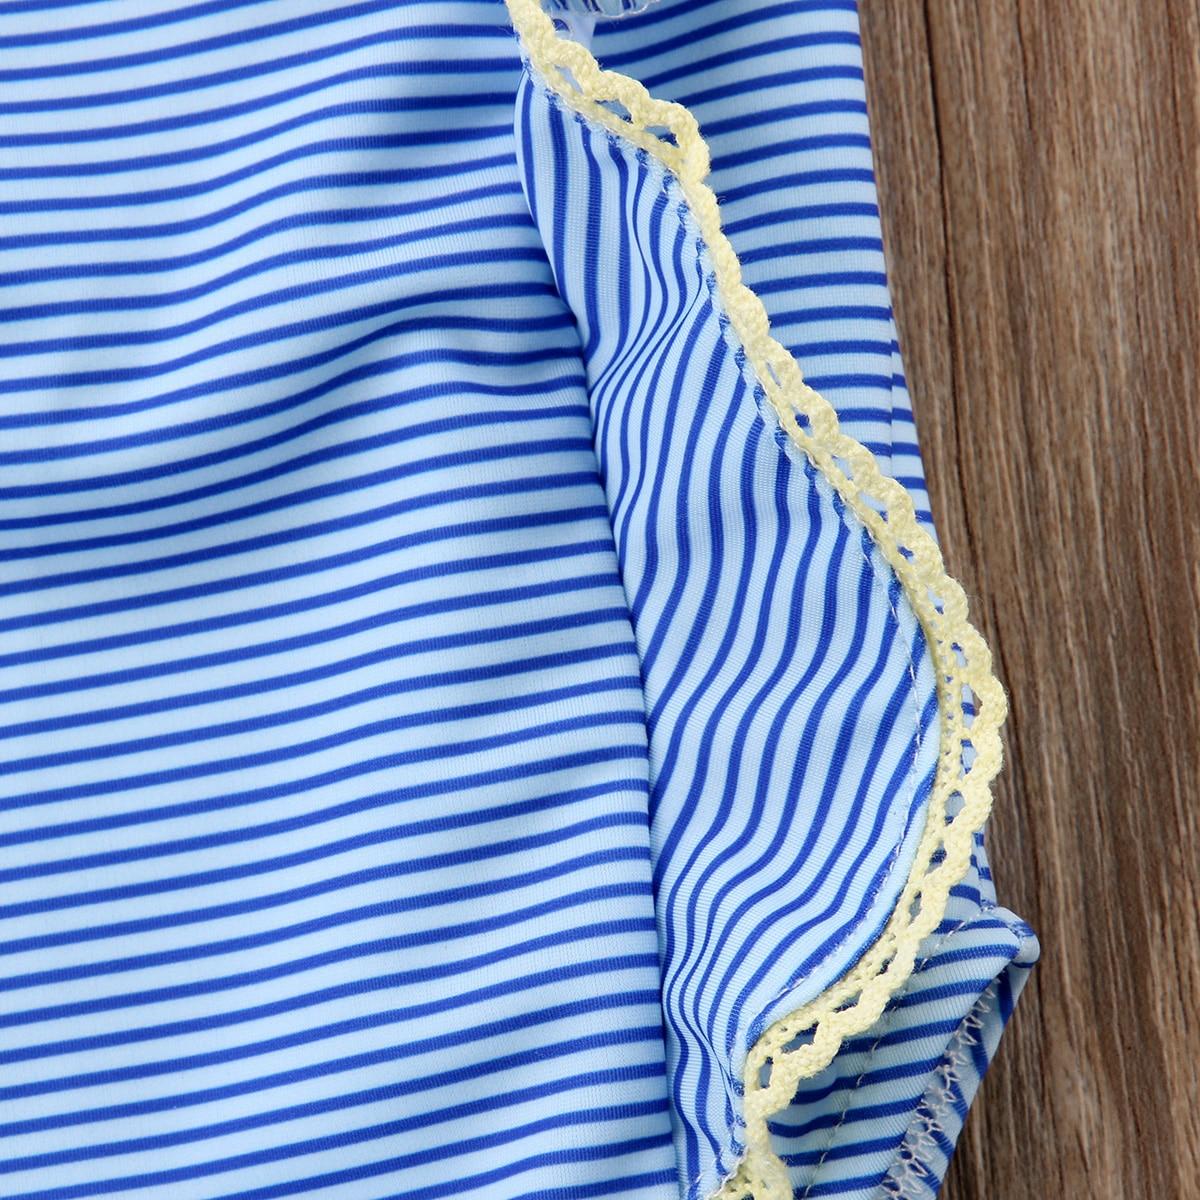 Fashion Toddler Kids Baby Girls Striped Ruffles Sleeveless Bikini Swimwear Swimsuit Bathing Suit Beachwear 0-24M